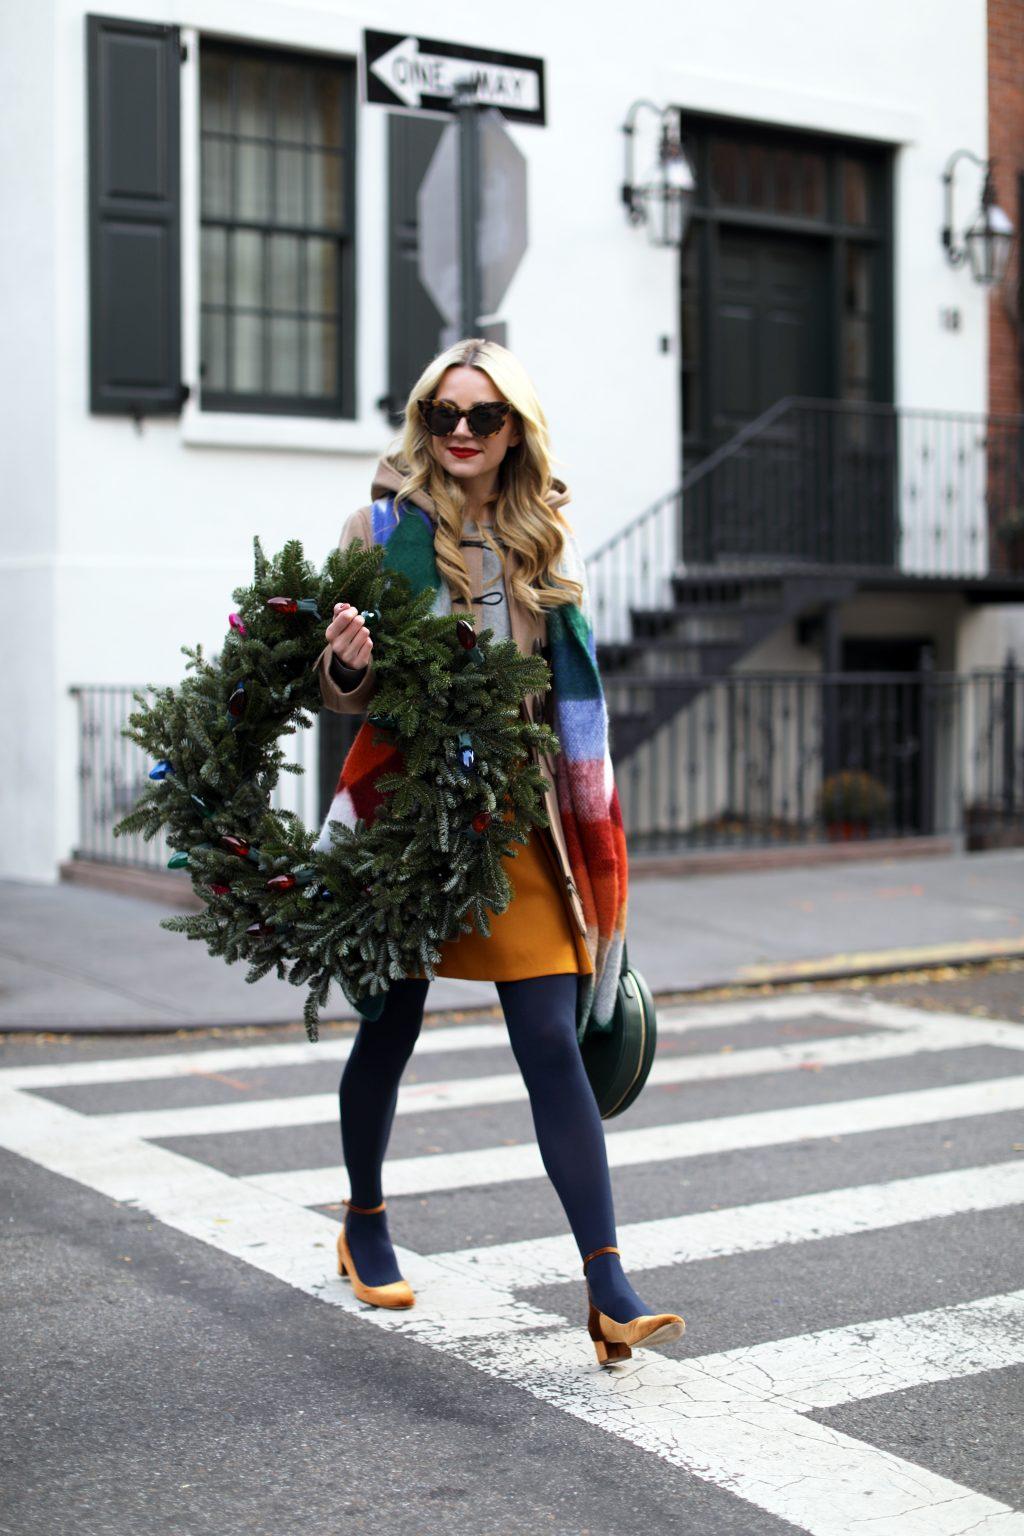 blair-eadie-atlantic-pacific-holiday-wreath-mansur-gavriel-9